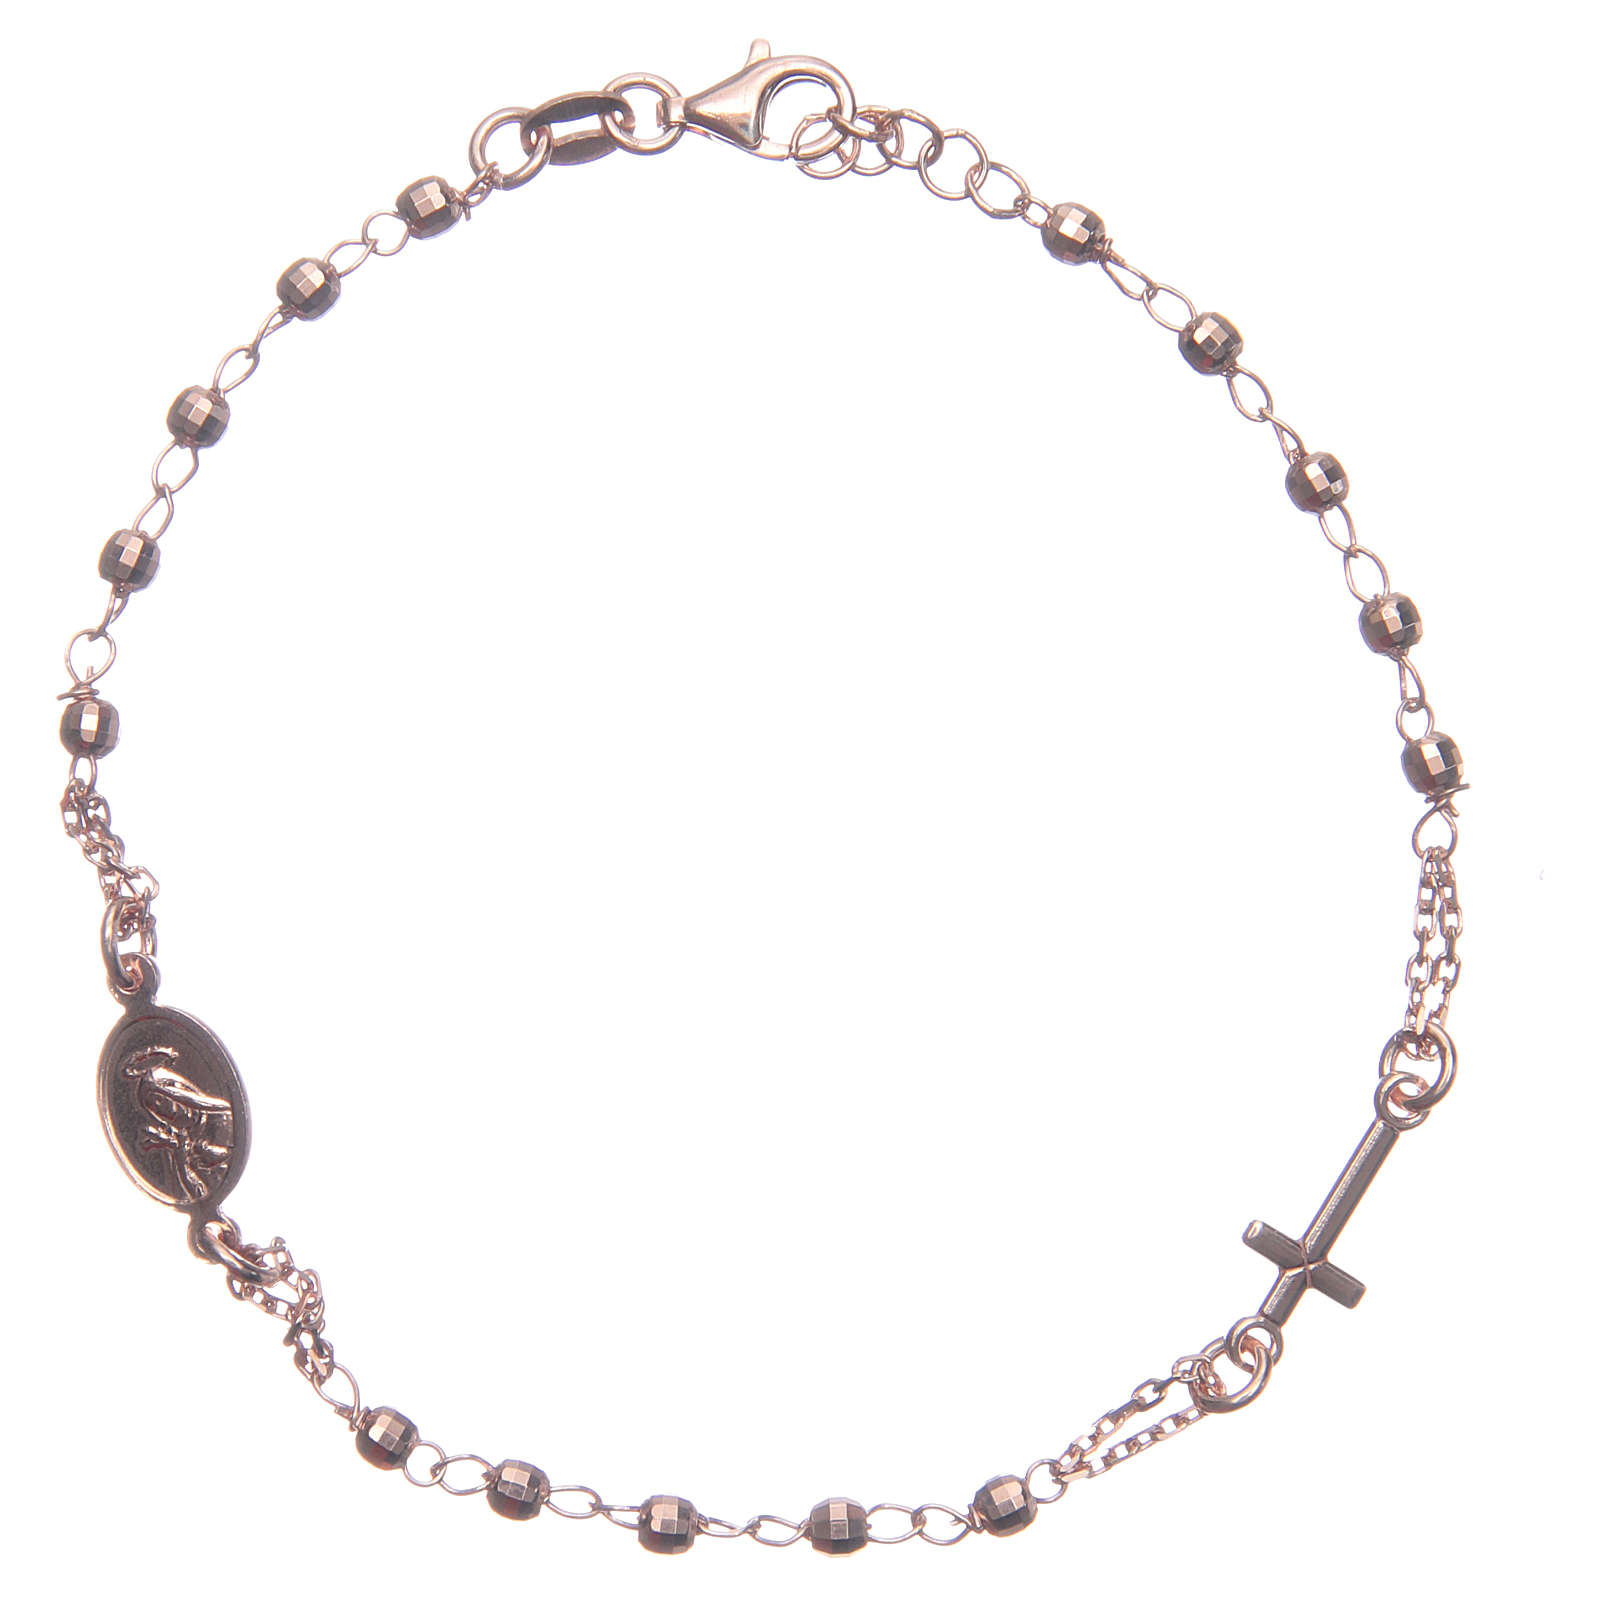 Bracciale rosario colore rosé Santa Rita argento 925 4